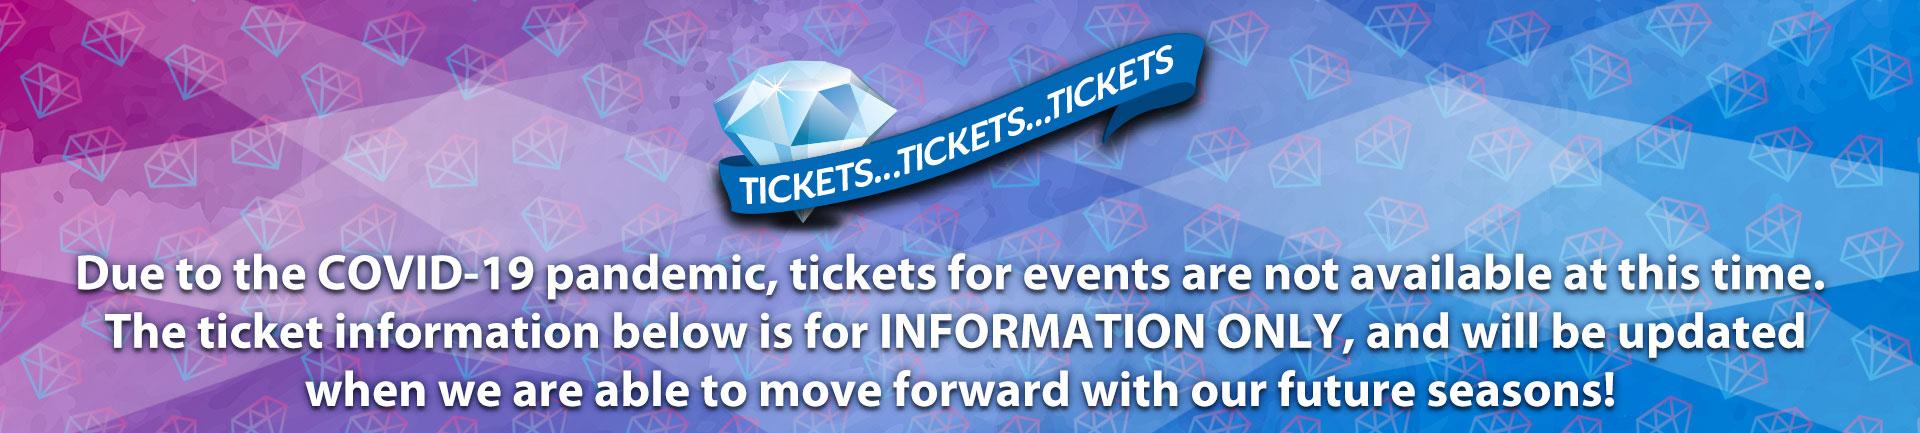 Boerne Performing Arts Tickets